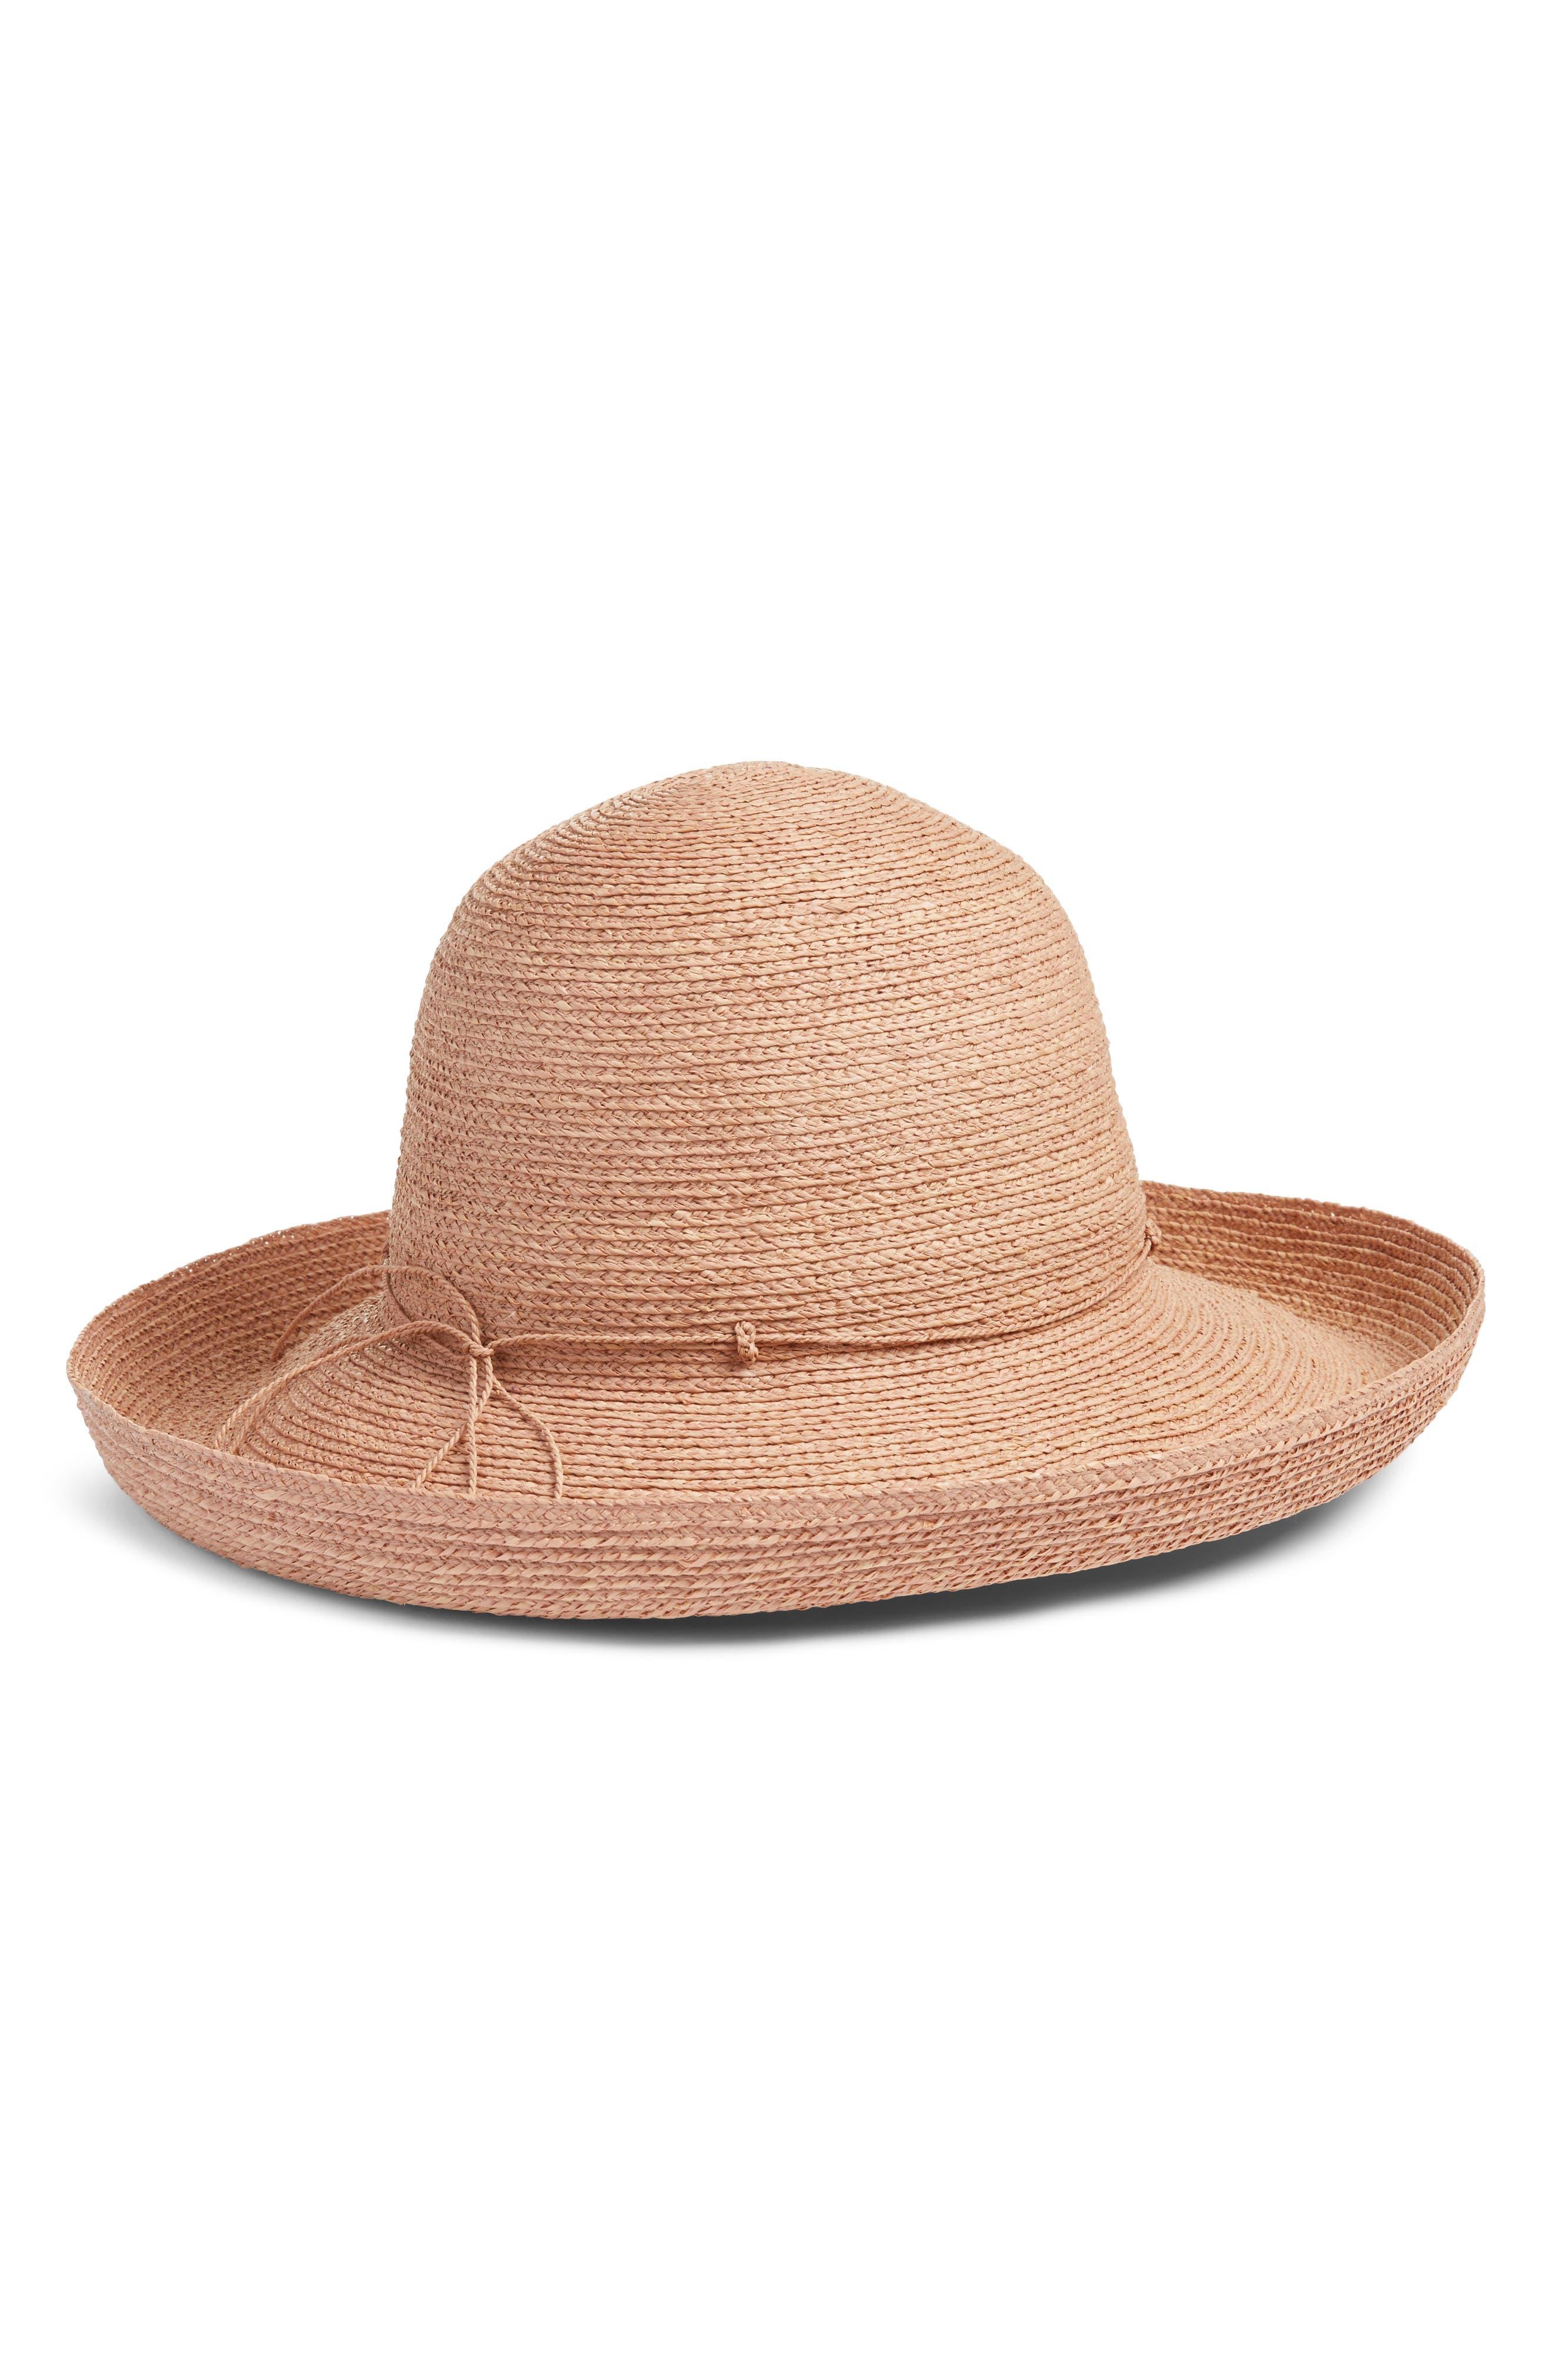 Alternate Image 1 Selected - Helen Kaminski Rolled Brim Raffia Hat